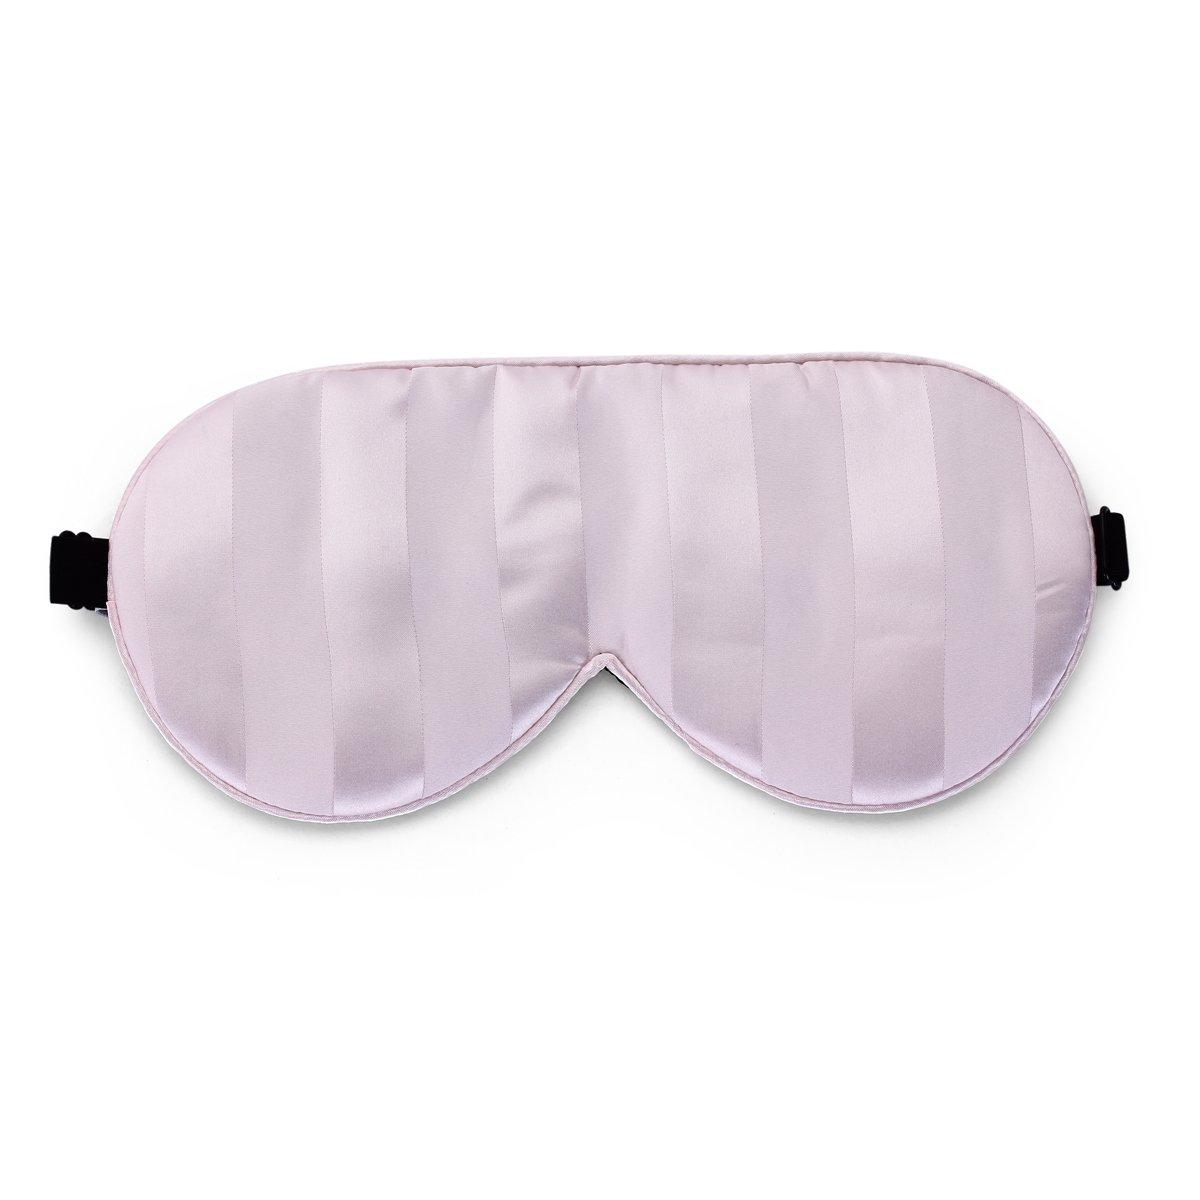 ALASKA BEAR® Natural silk sleep mask & blindfold, super-smooth eye mask (Pink Stripe)